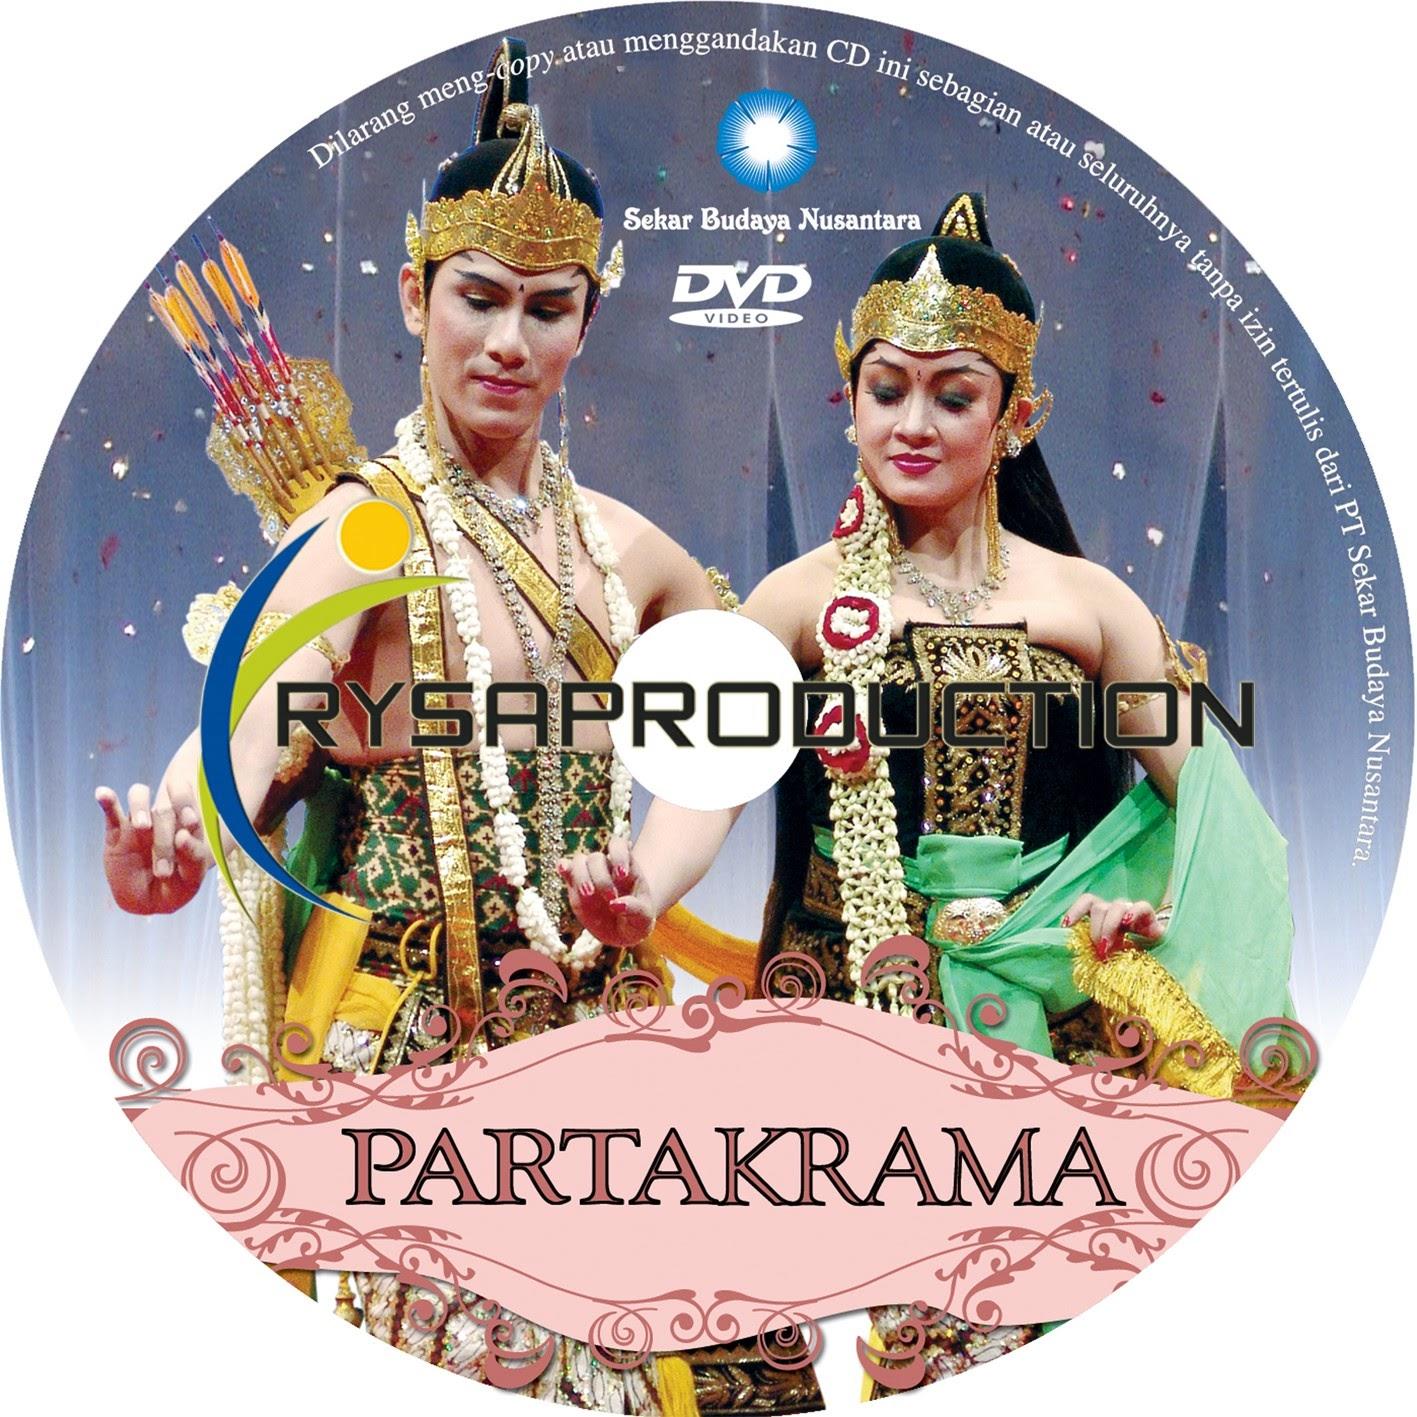 Partakrama